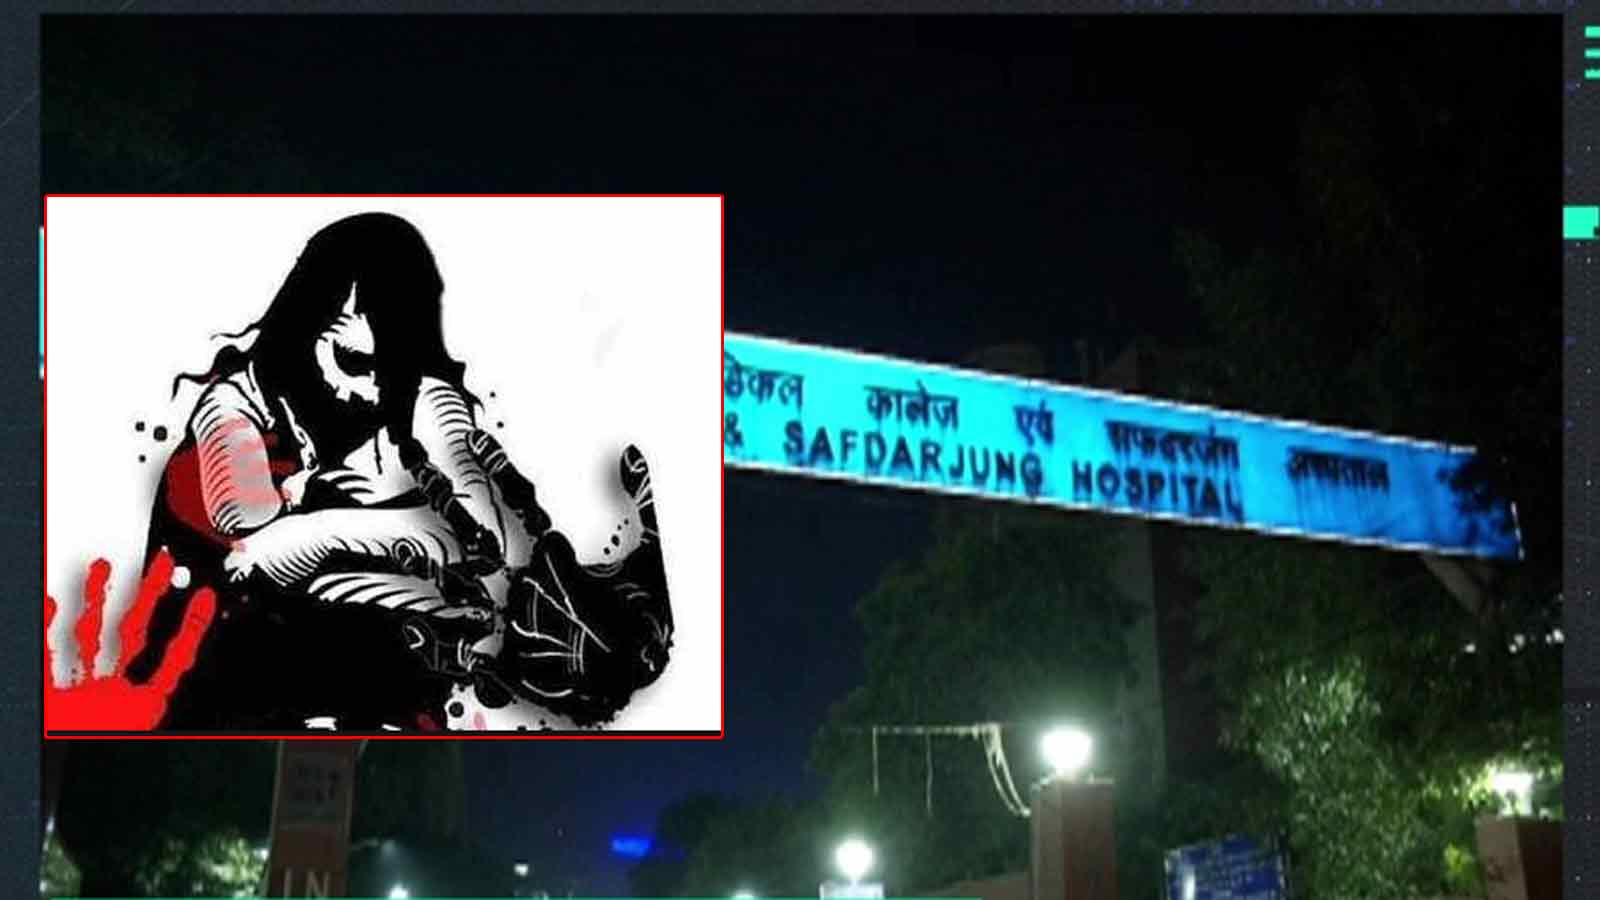 unnao-rape-victim-dies-due-to-cardiac-arrest-in-delhis-safdarjung-hospital